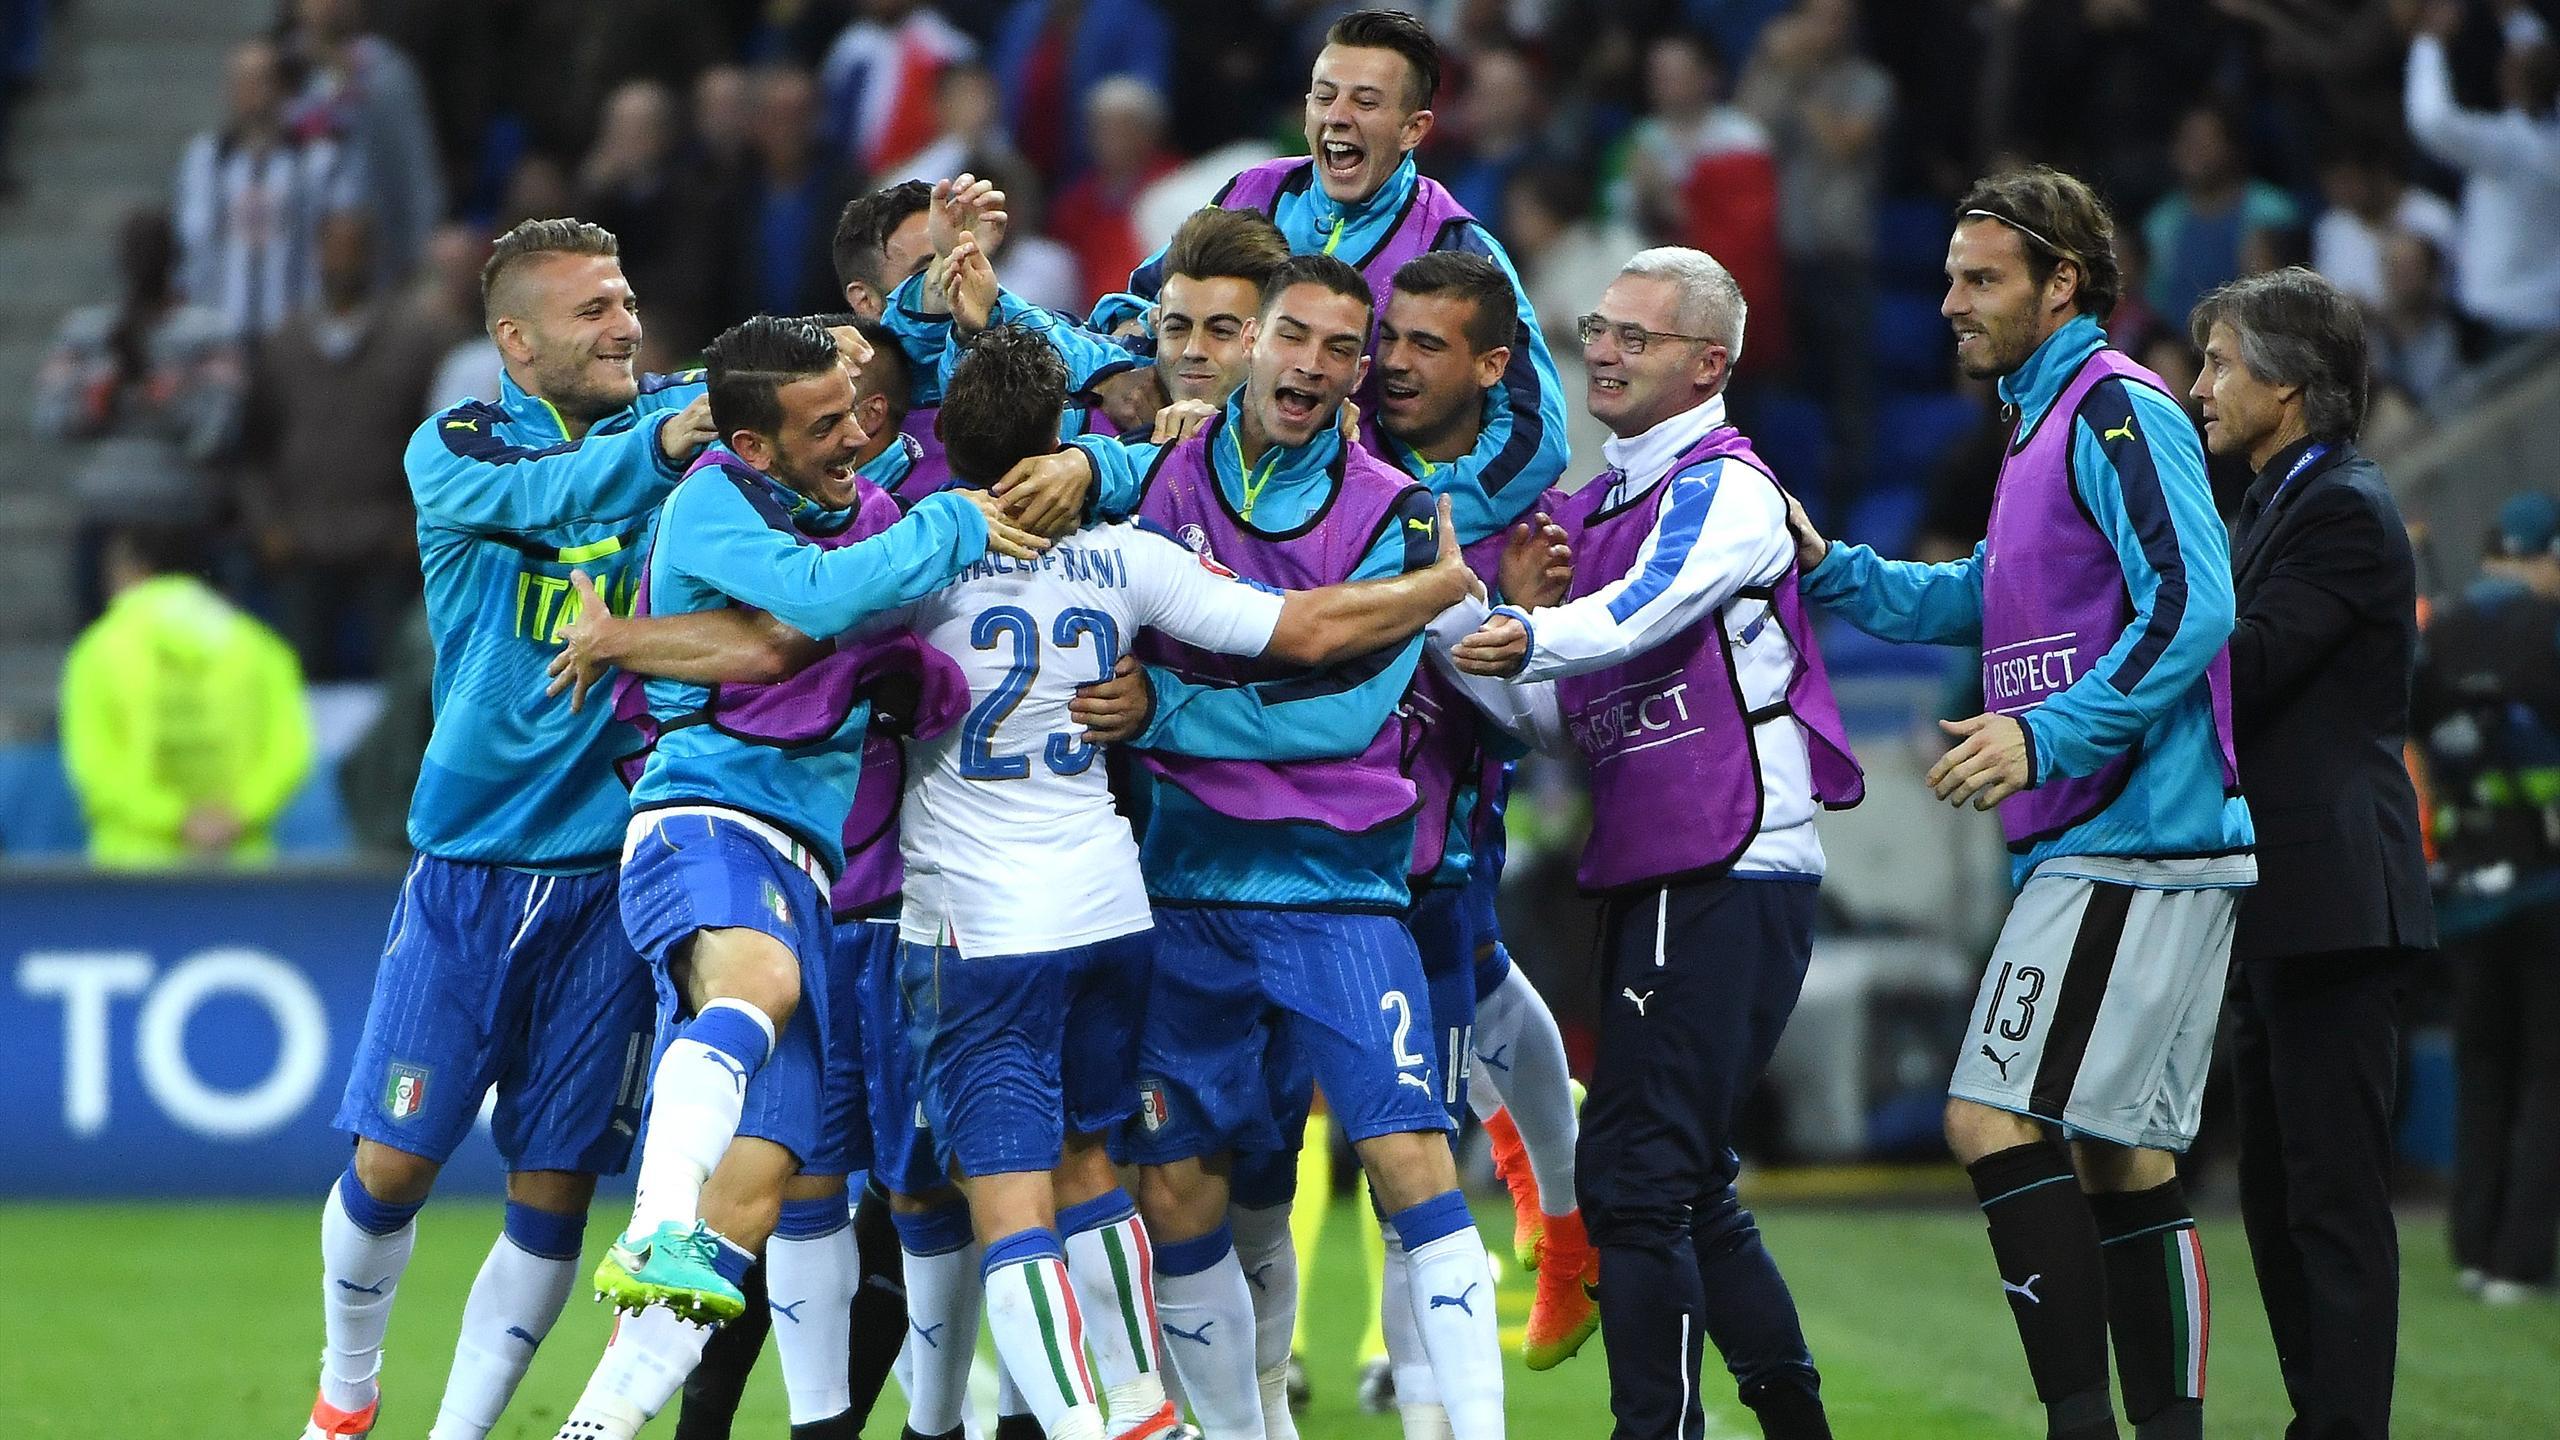 Giaccherini - Belgium v Italy - Euro 2016